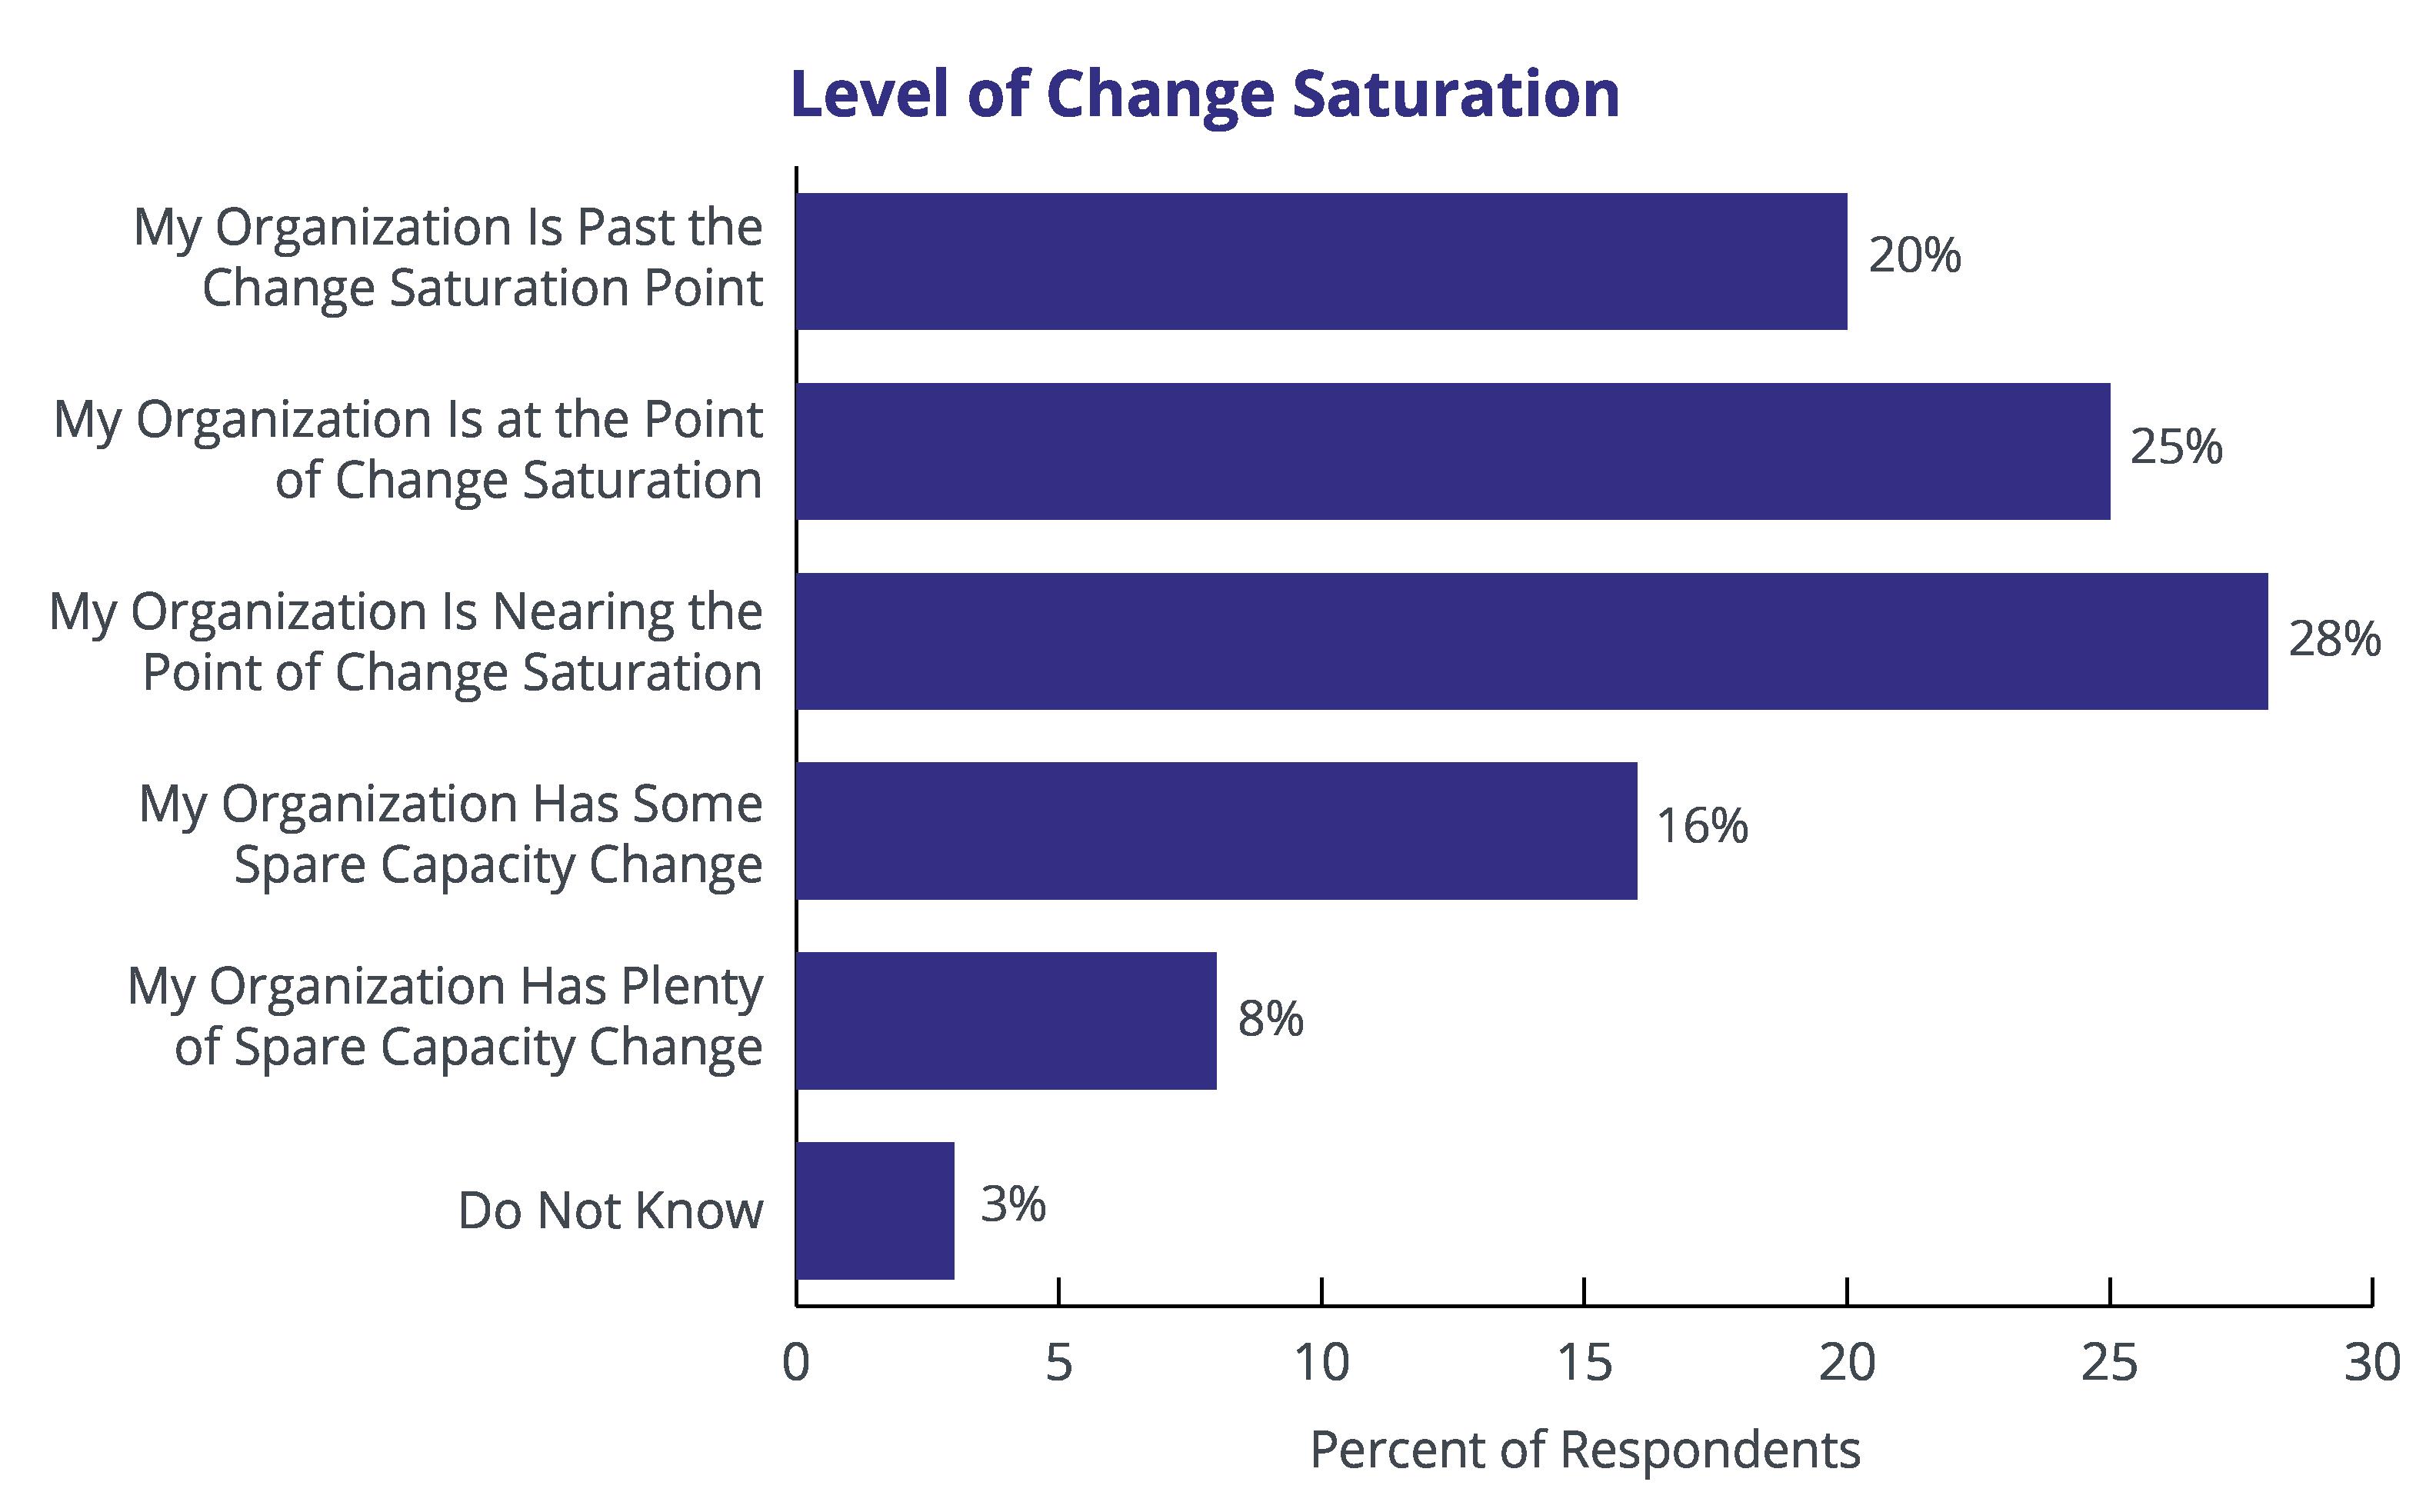 Level-of-Change-Saturation-2019-data